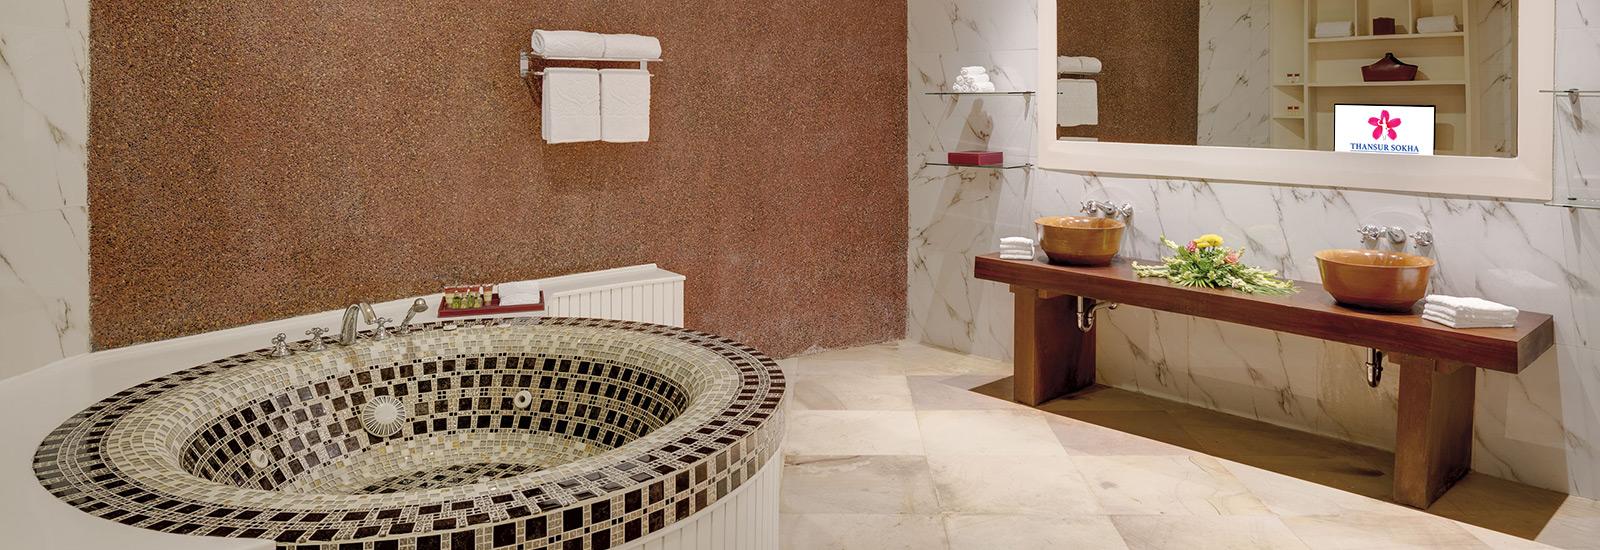 Yihup Villa Suite Lounge